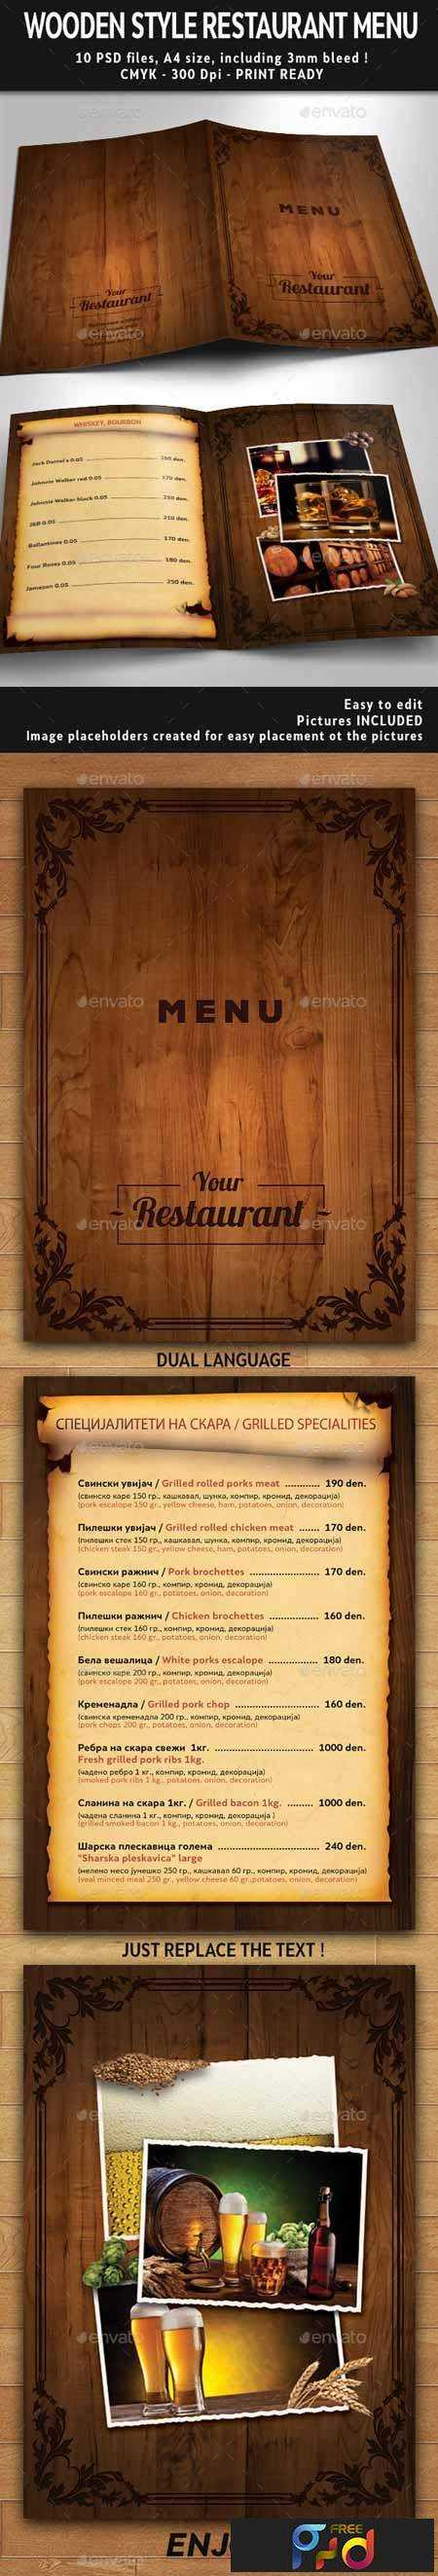 freepsdvn-com_1434014243_wooden-style-restaurant-menu-psd-template-11610856